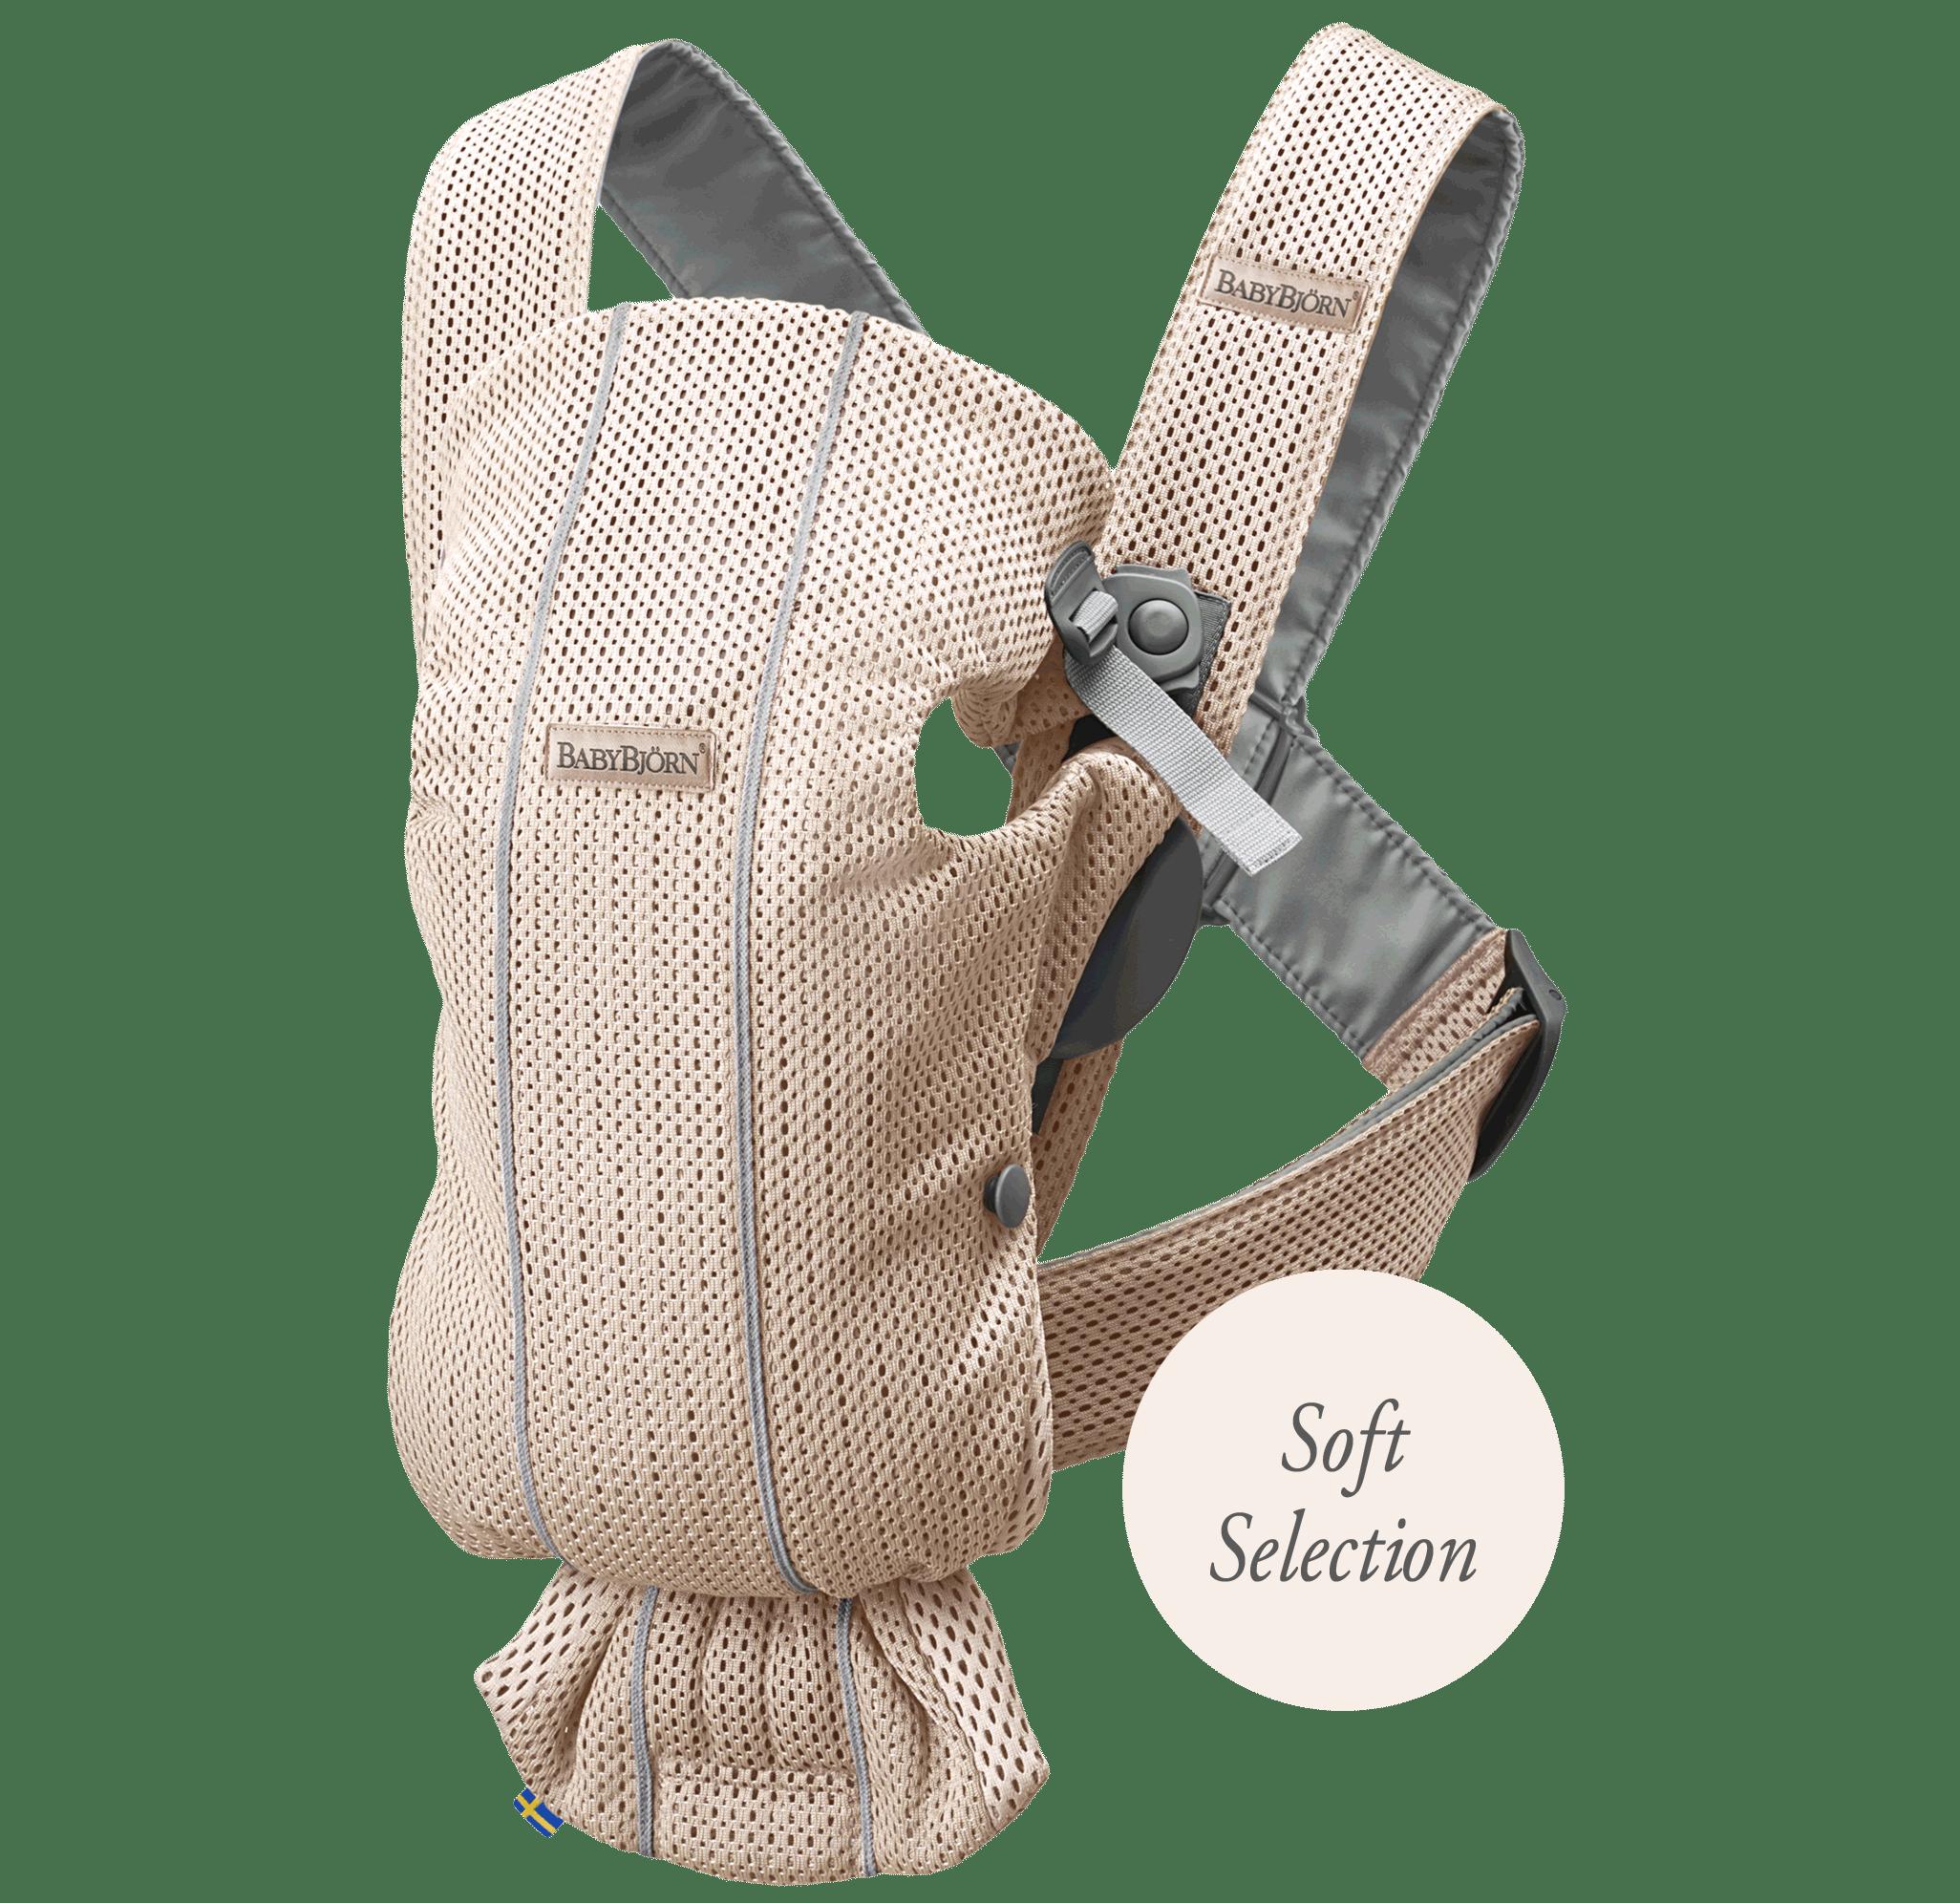 Bärsele Mini Pärlemorosa Mesh Soft Selection - BABYBJÖRN